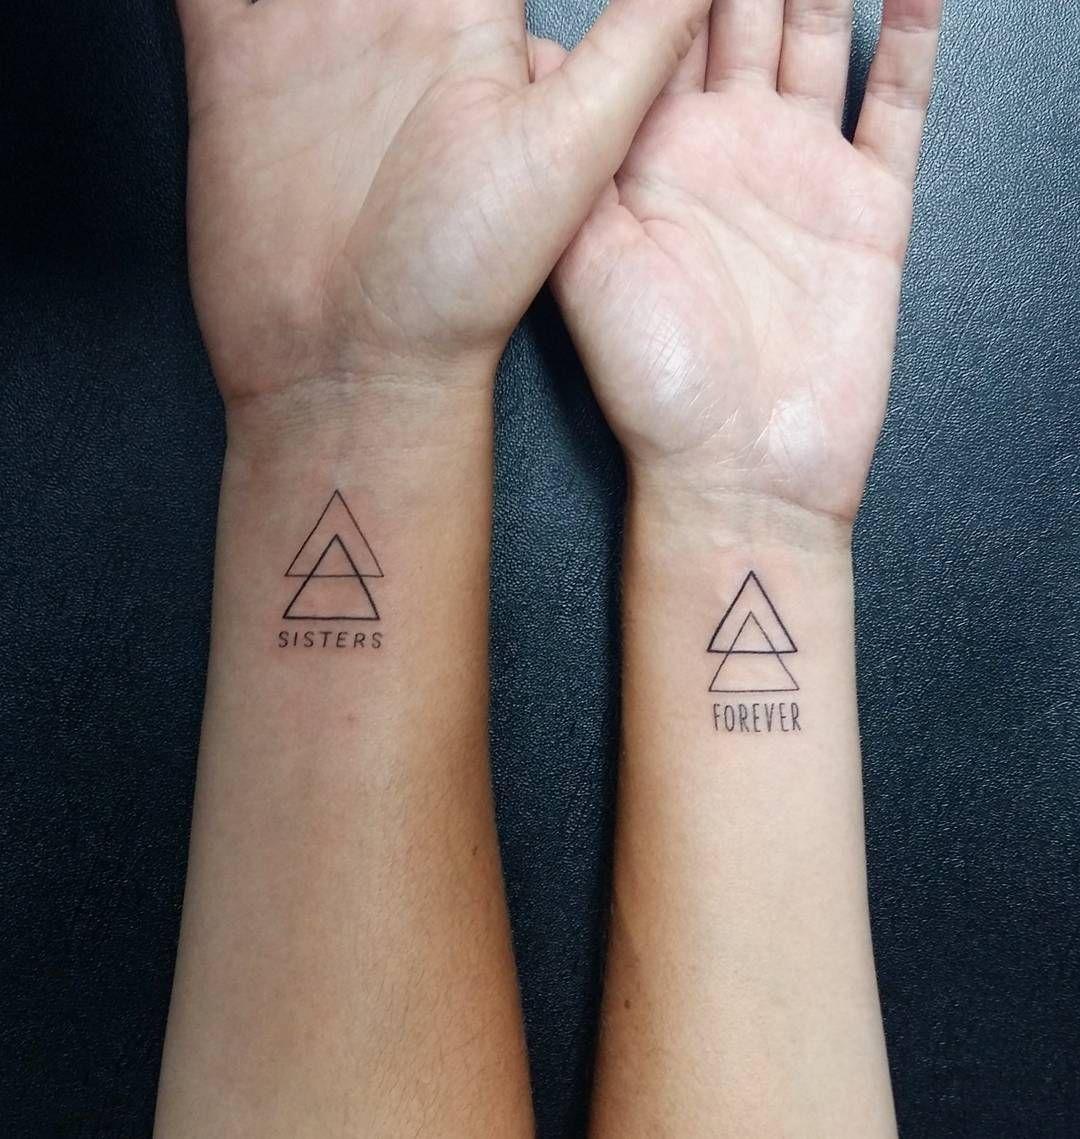 Pin By Kristy Cantu On Fun Sister Tattoos Tattoos Sibling Tattoos